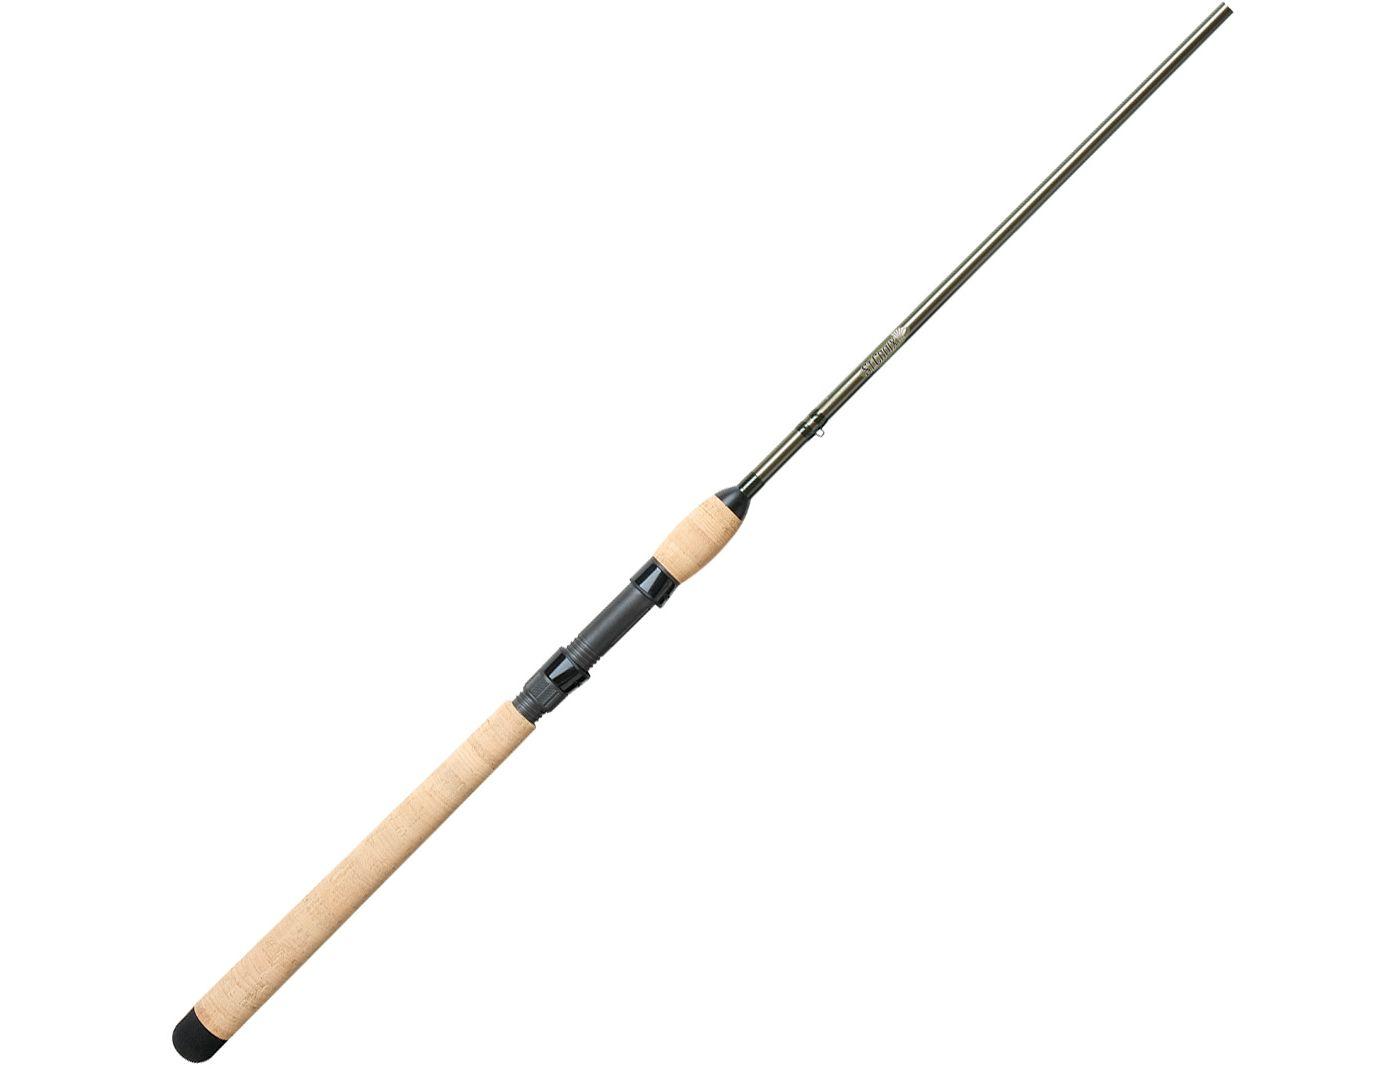 St. Croix Wild River Salmon/Steelhead Spinning Rods